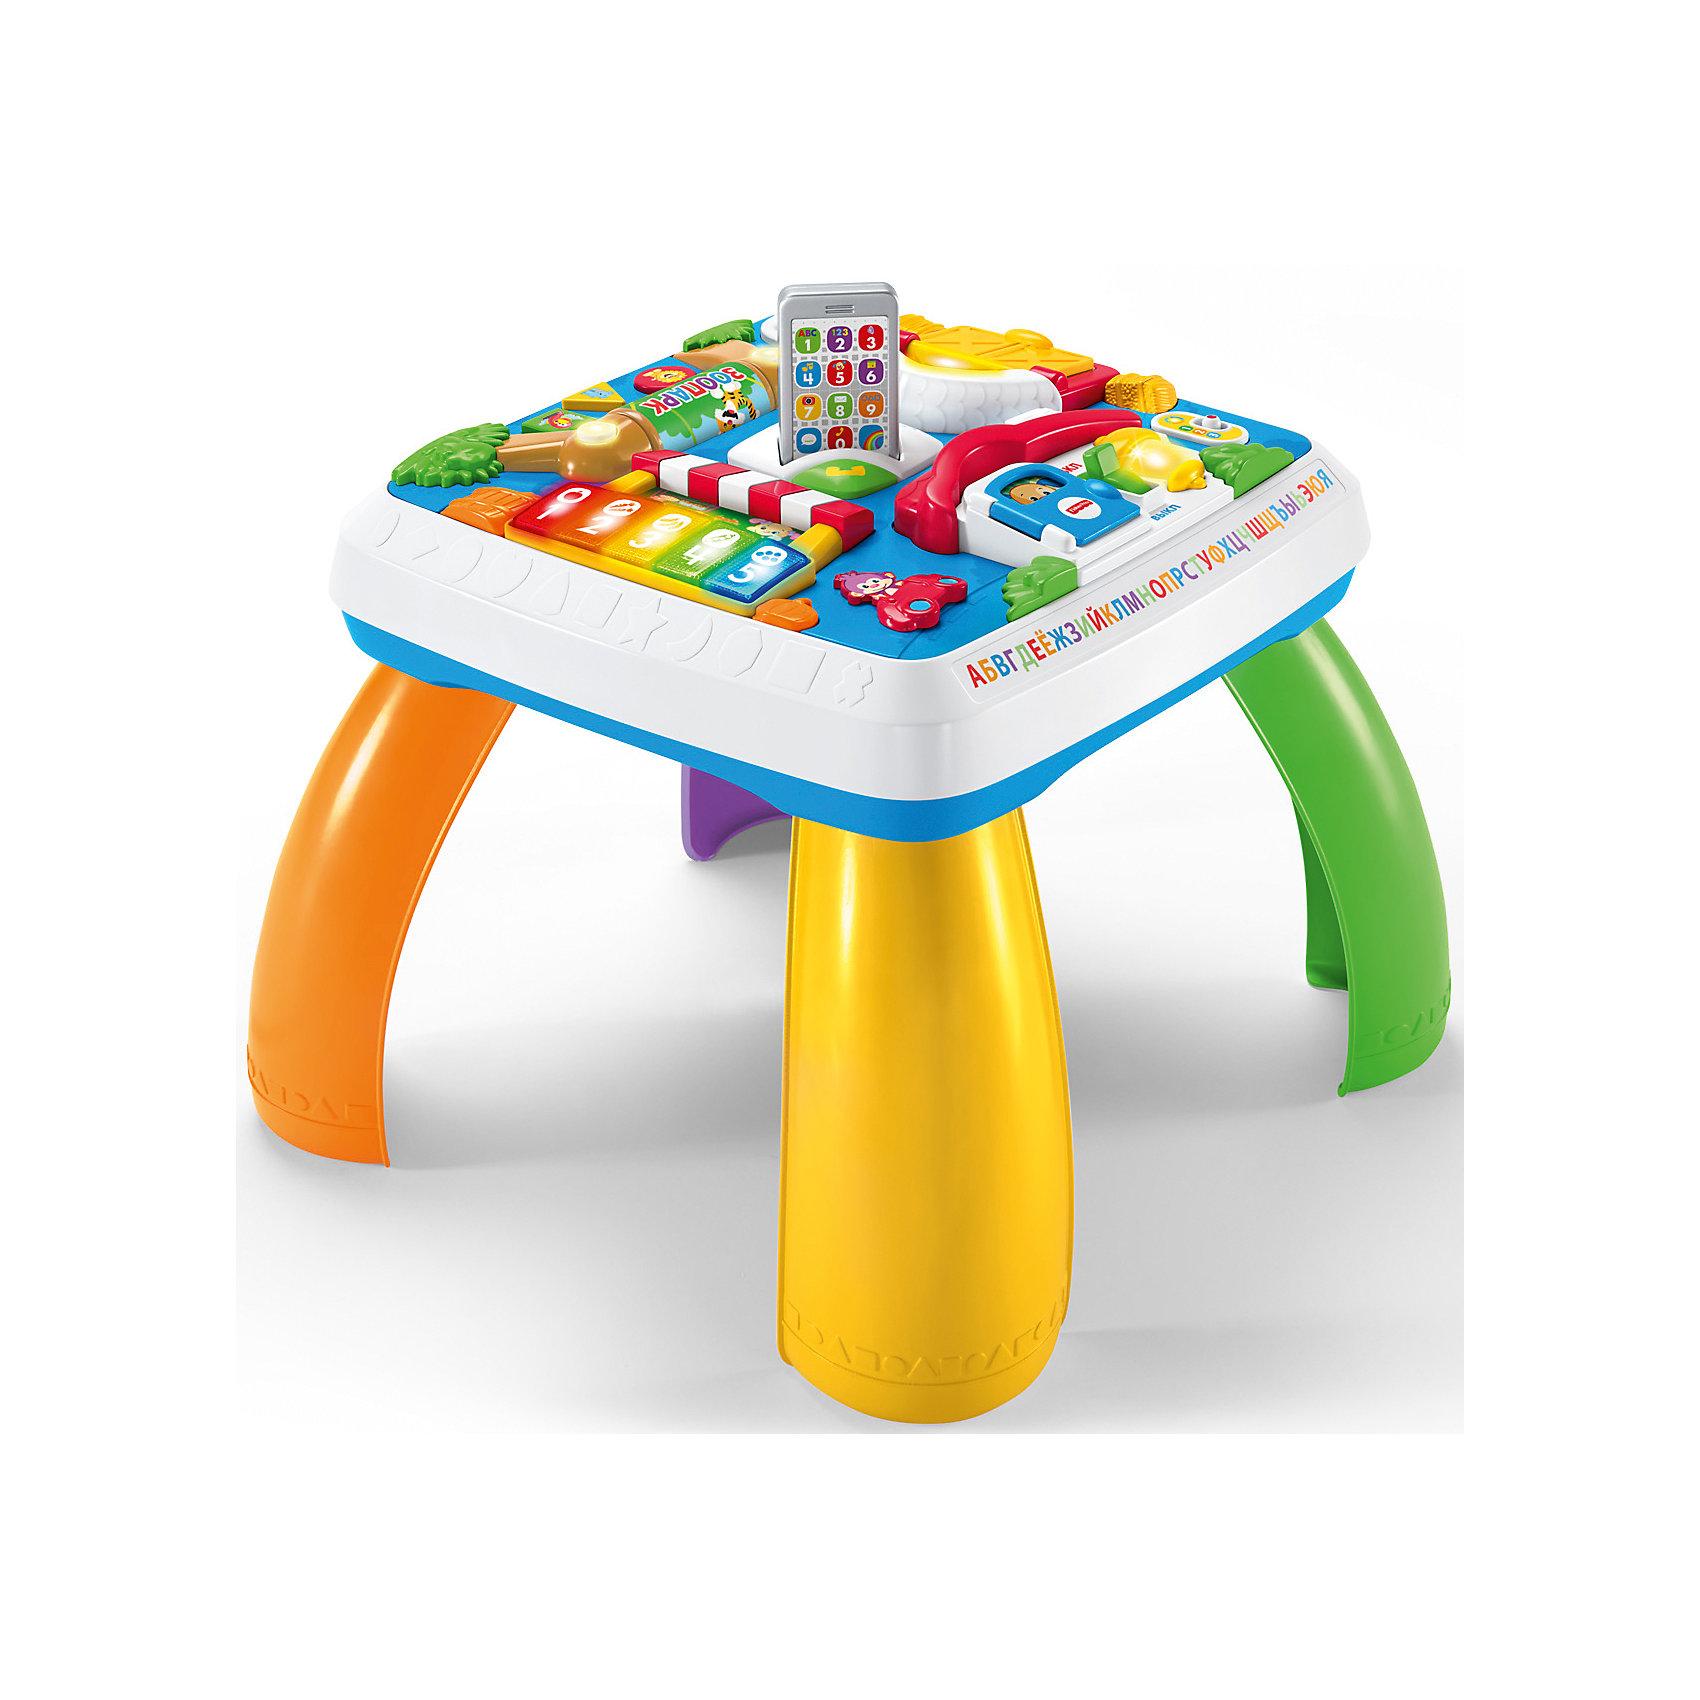 Mattel Развивающий столик для малыша, Fisher Price  недорого